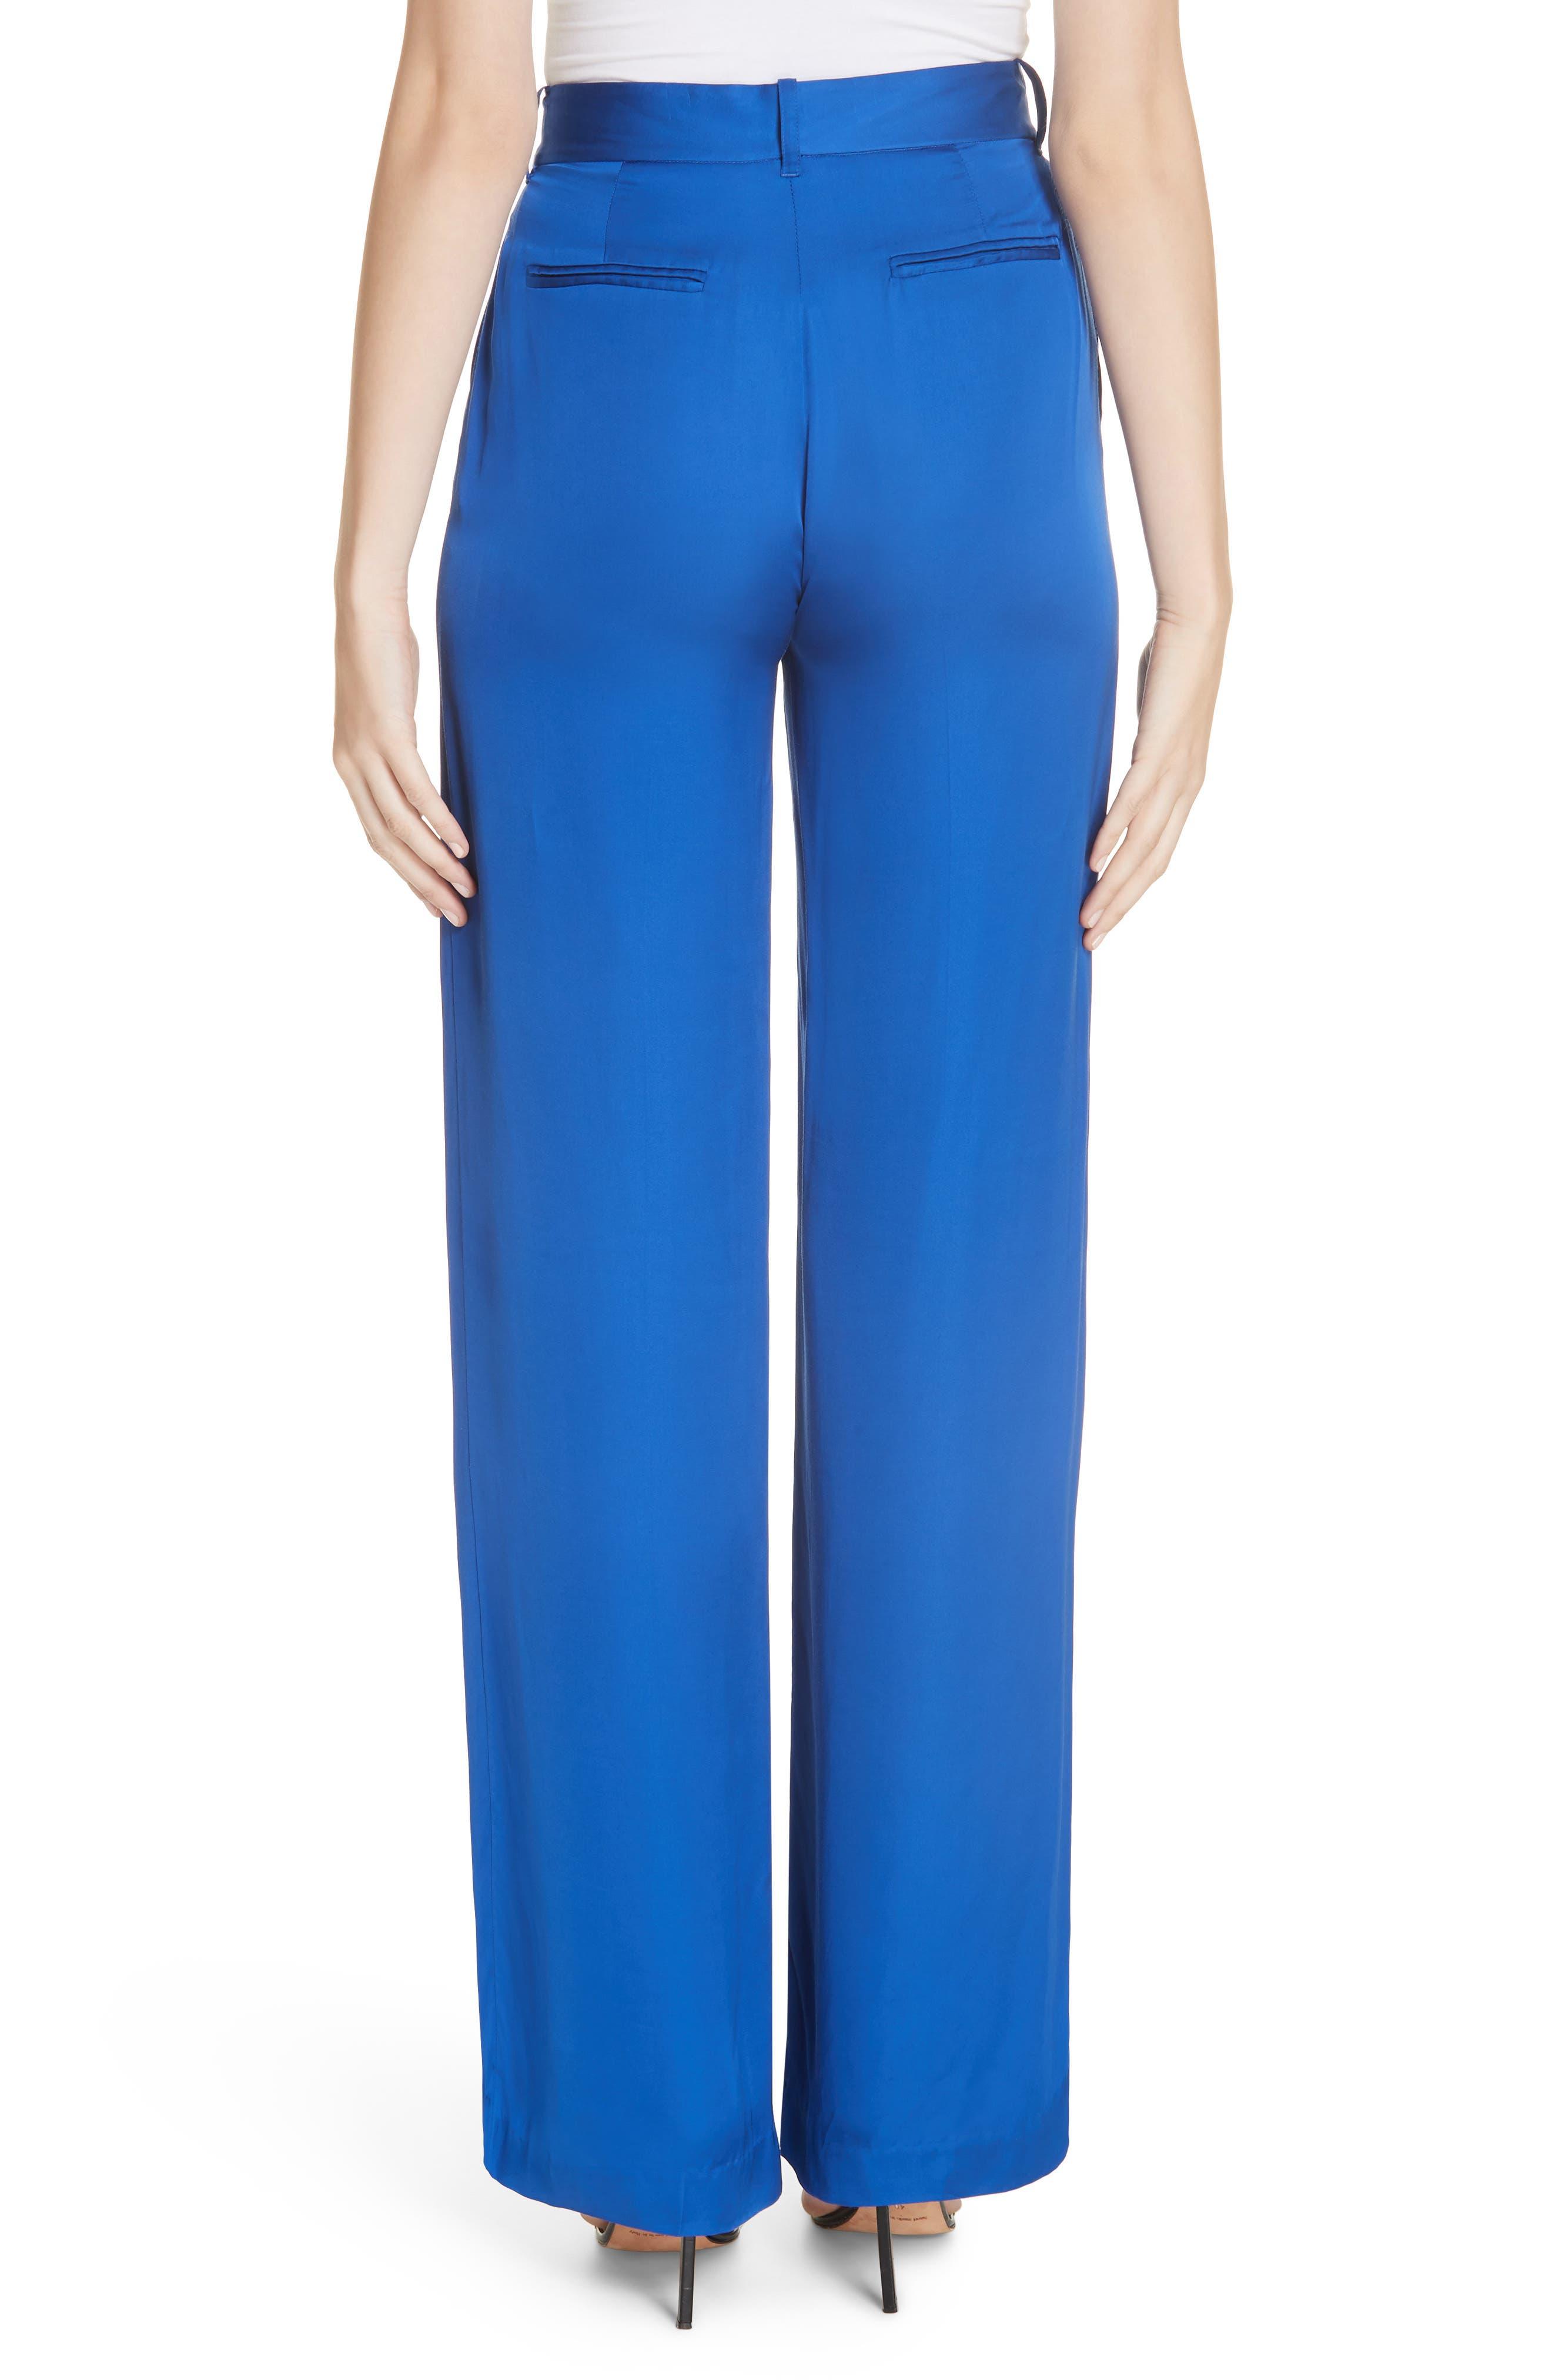 Arwen Trousers,                             Alternate thumbnail 2, color,                             HYPER BLUE